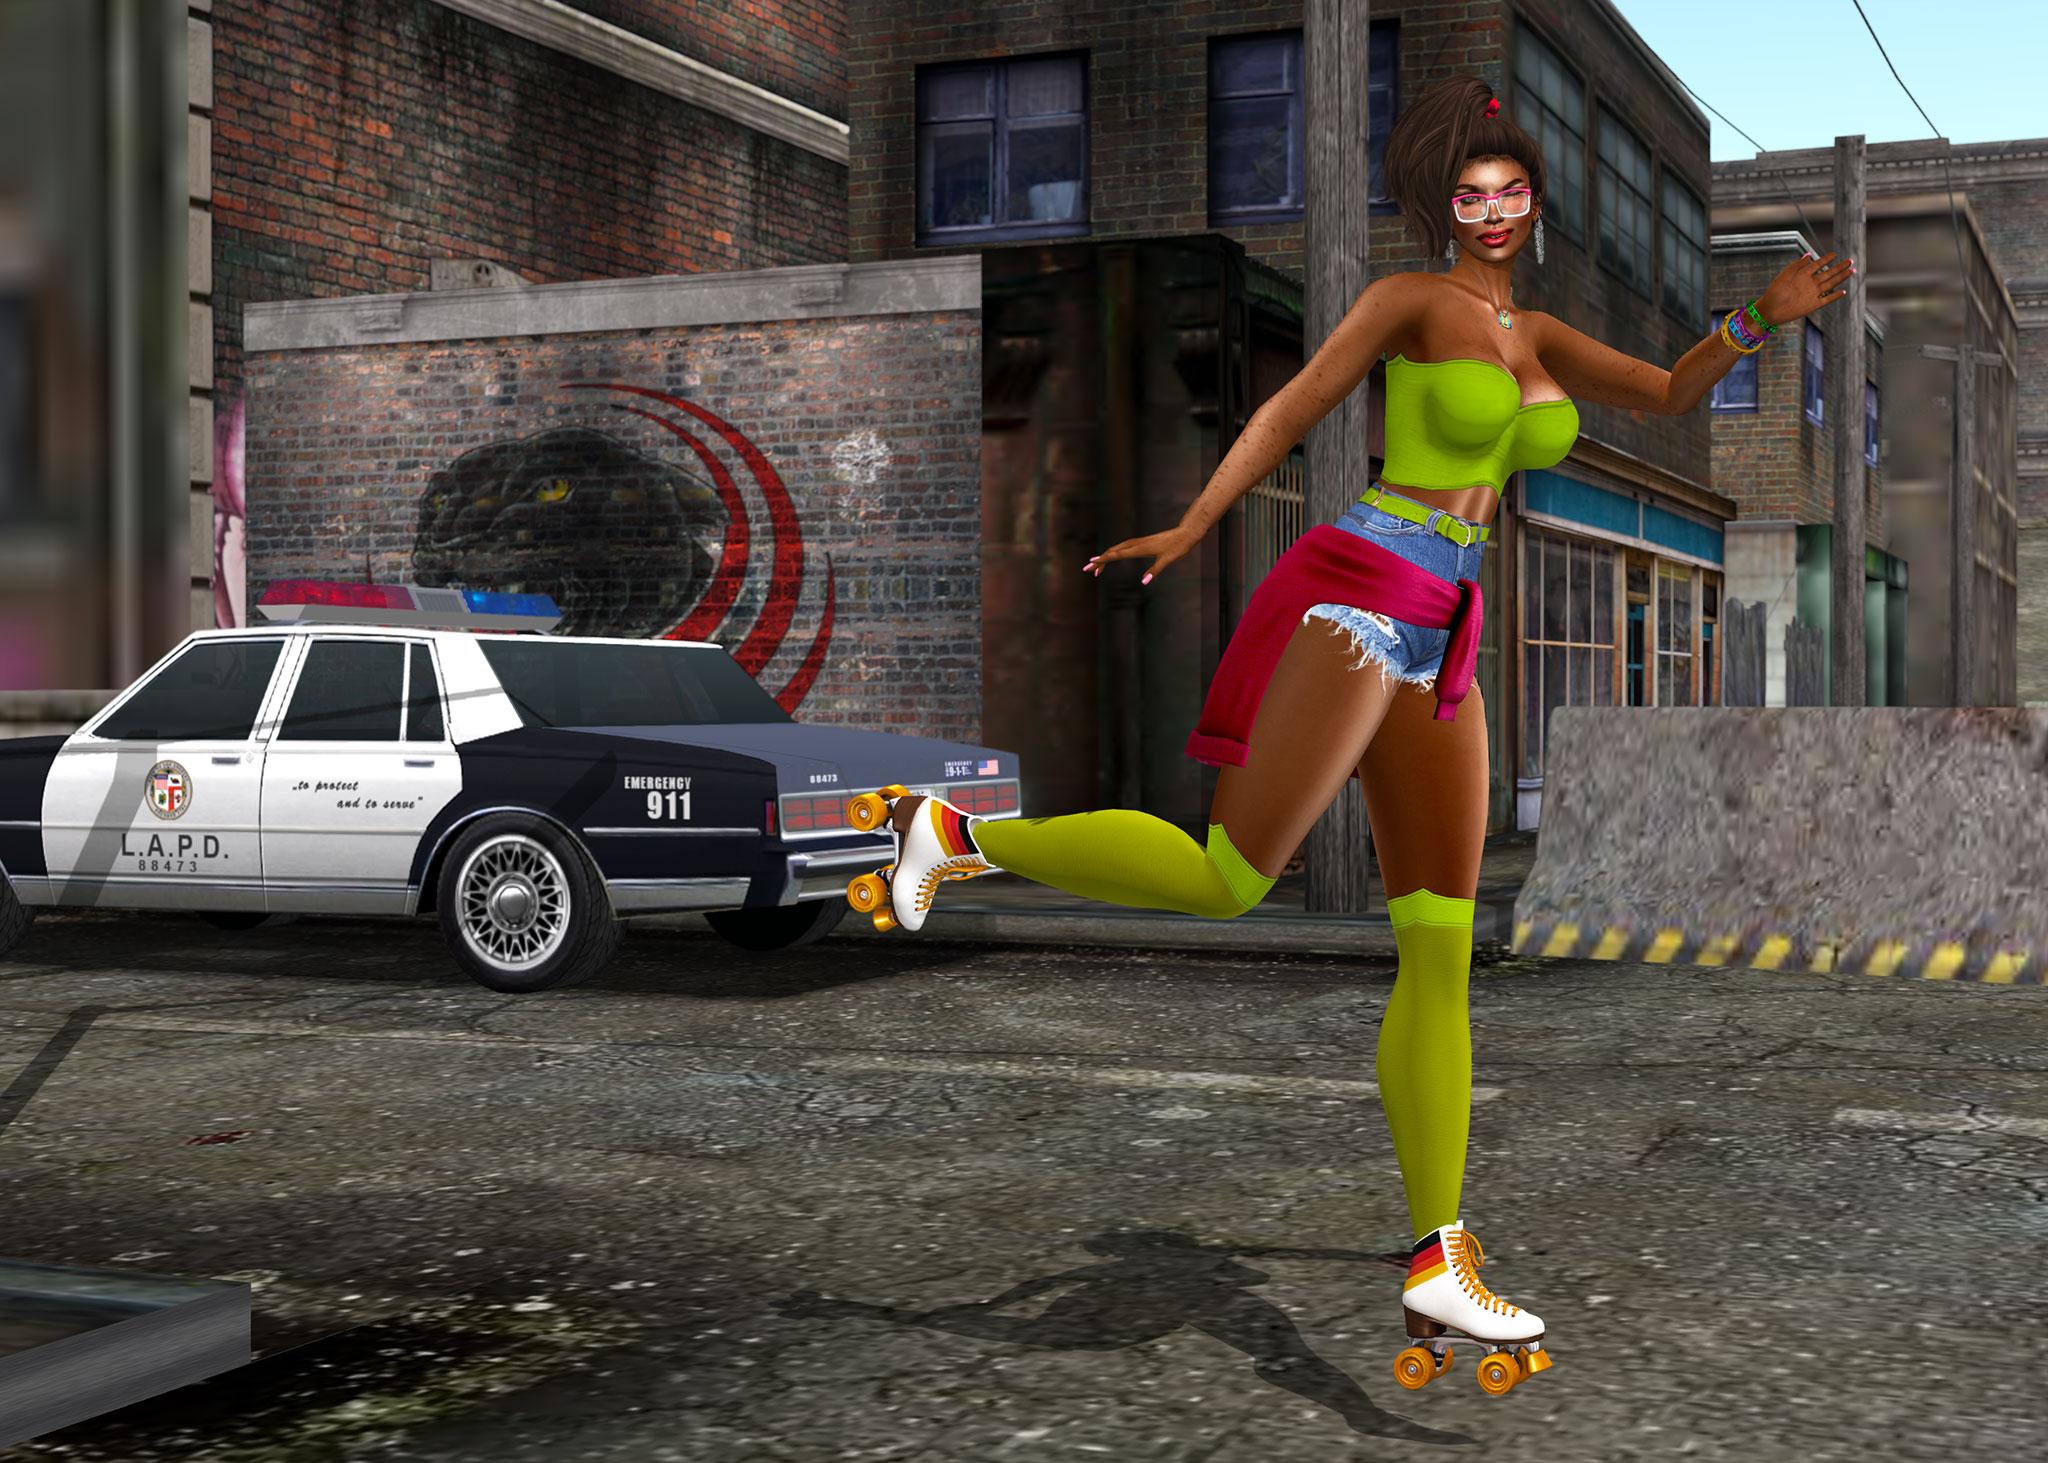 Brincando na rua